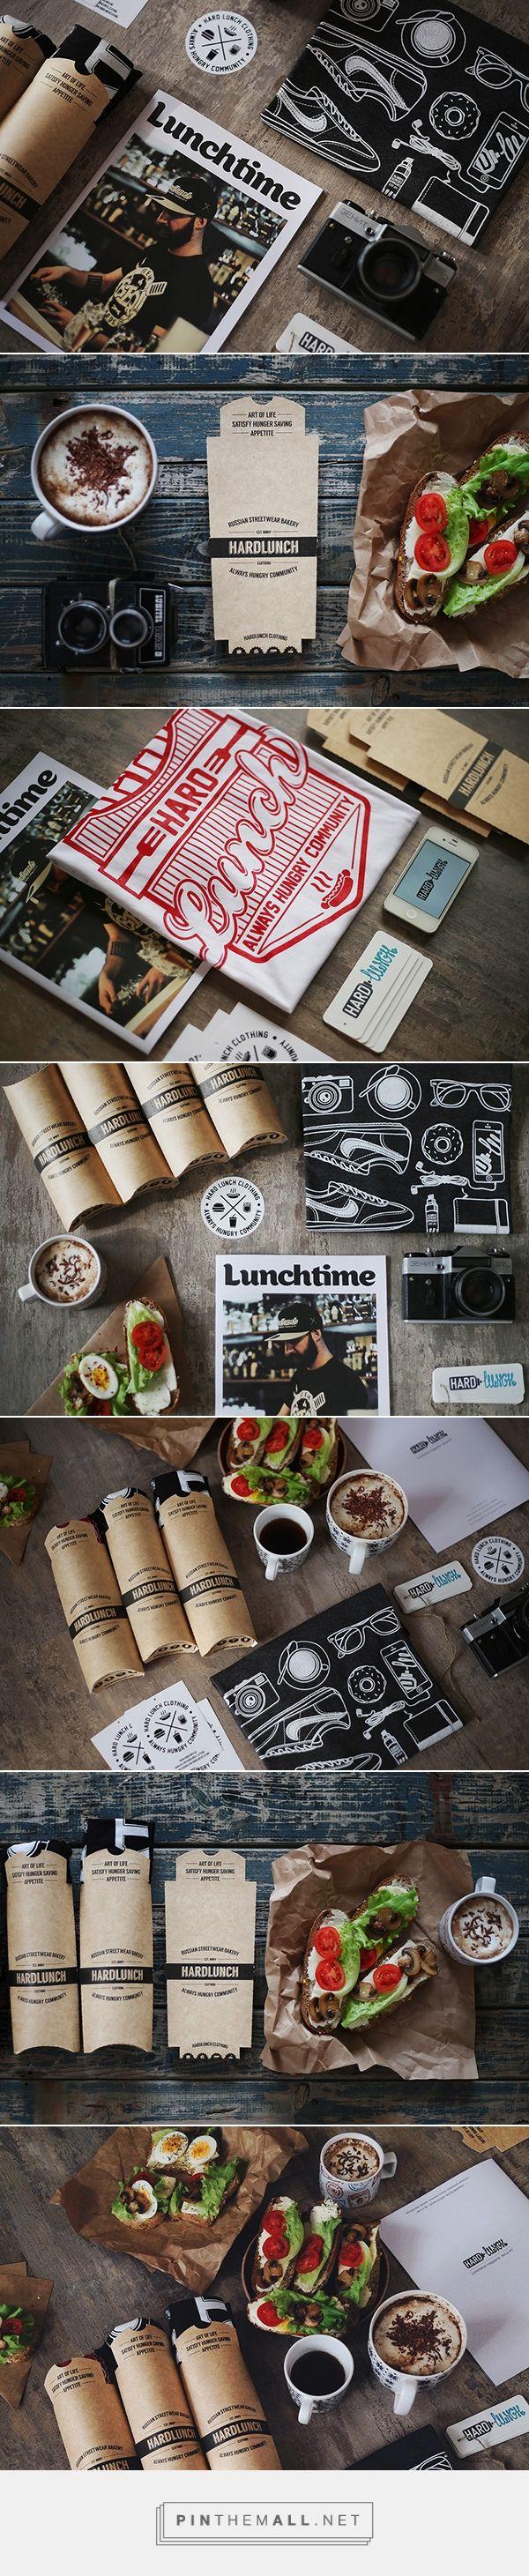 Hard Lunch T-Shirt Packaging